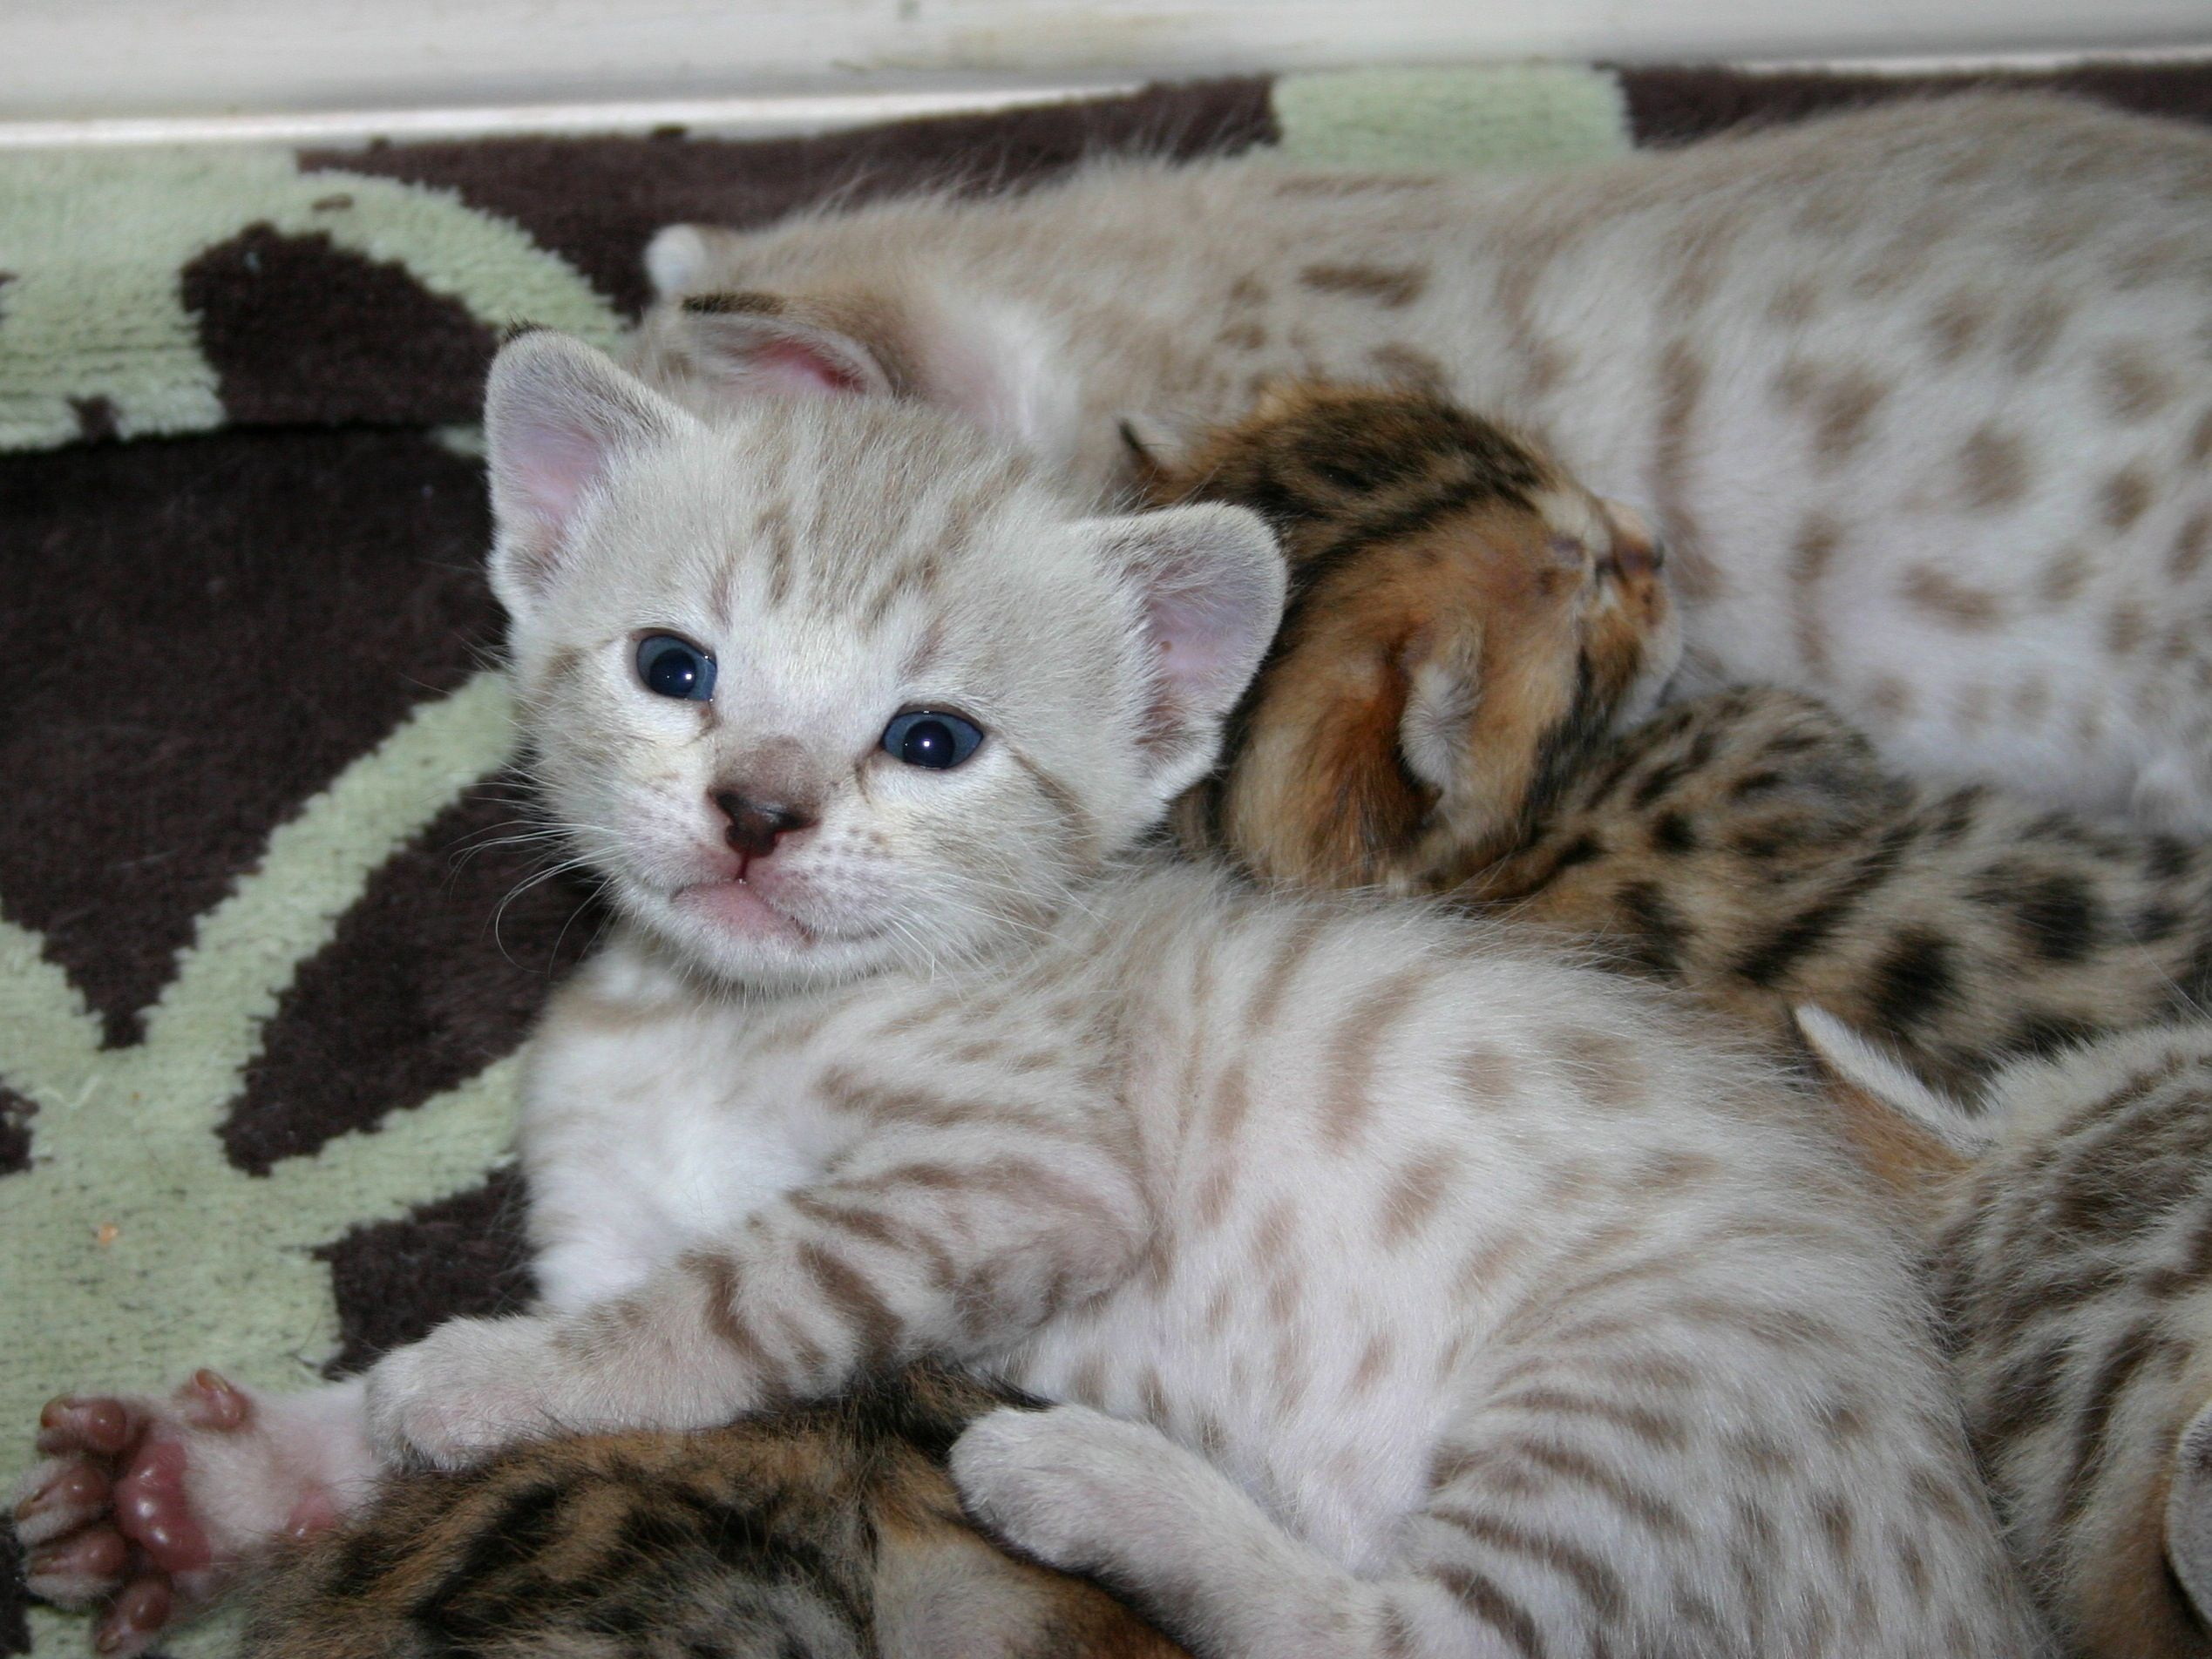 Snow Bengal kittens | Felines | Pinterest | Bengal kitten, Bengal ...